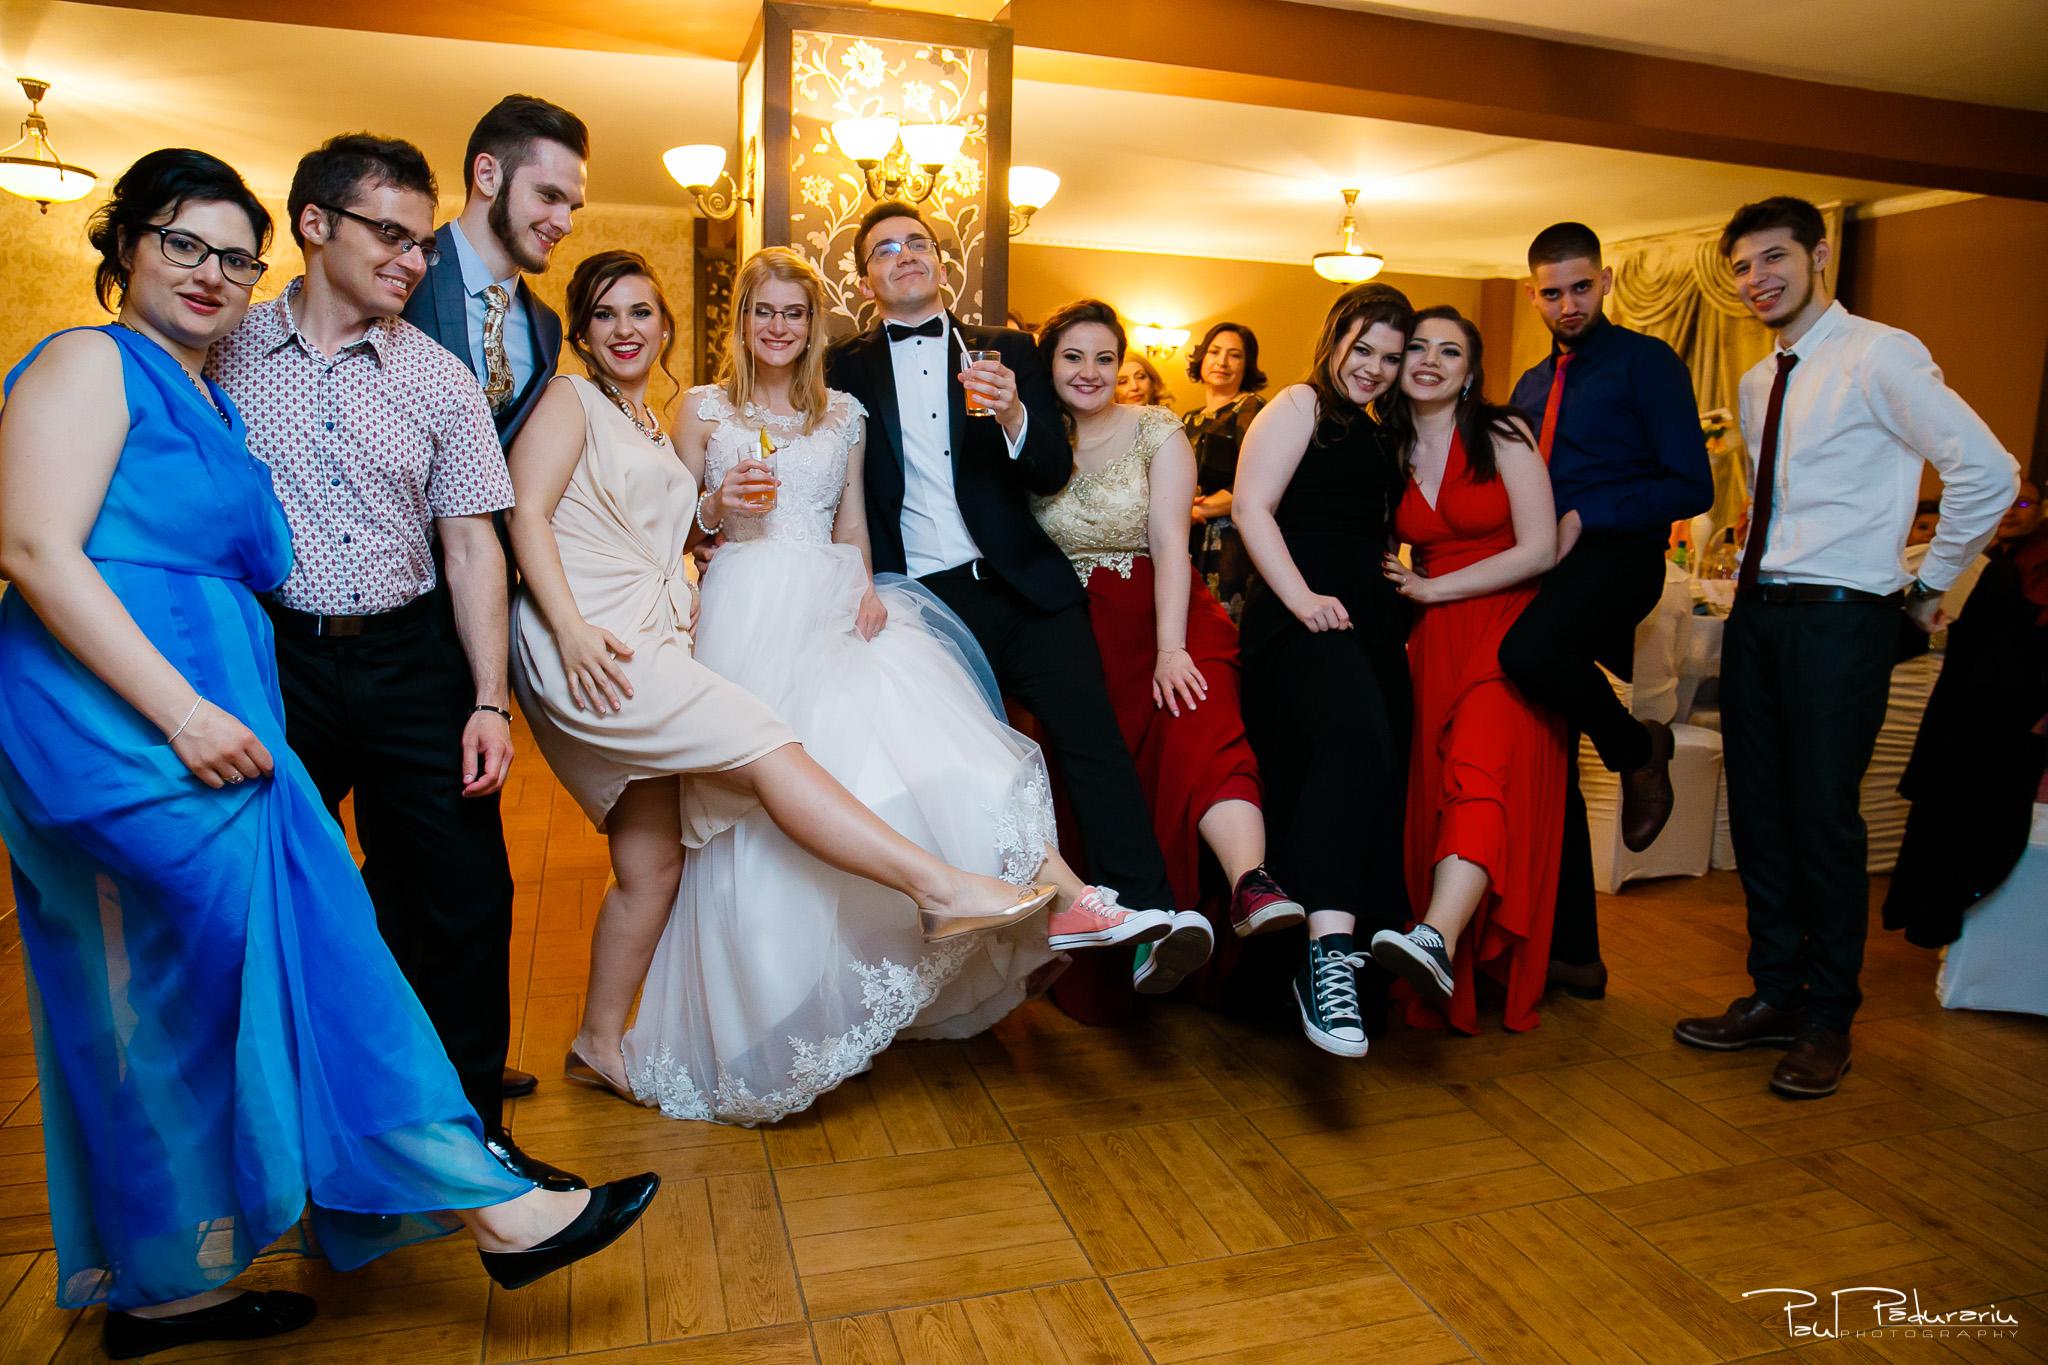 Anca si Razvan petrecere restaurant American Iasi - Paul Padurariu fotograf profesionist nunta iasi www.paulpadurariu.ro © 2018 Paul Padurariu 20